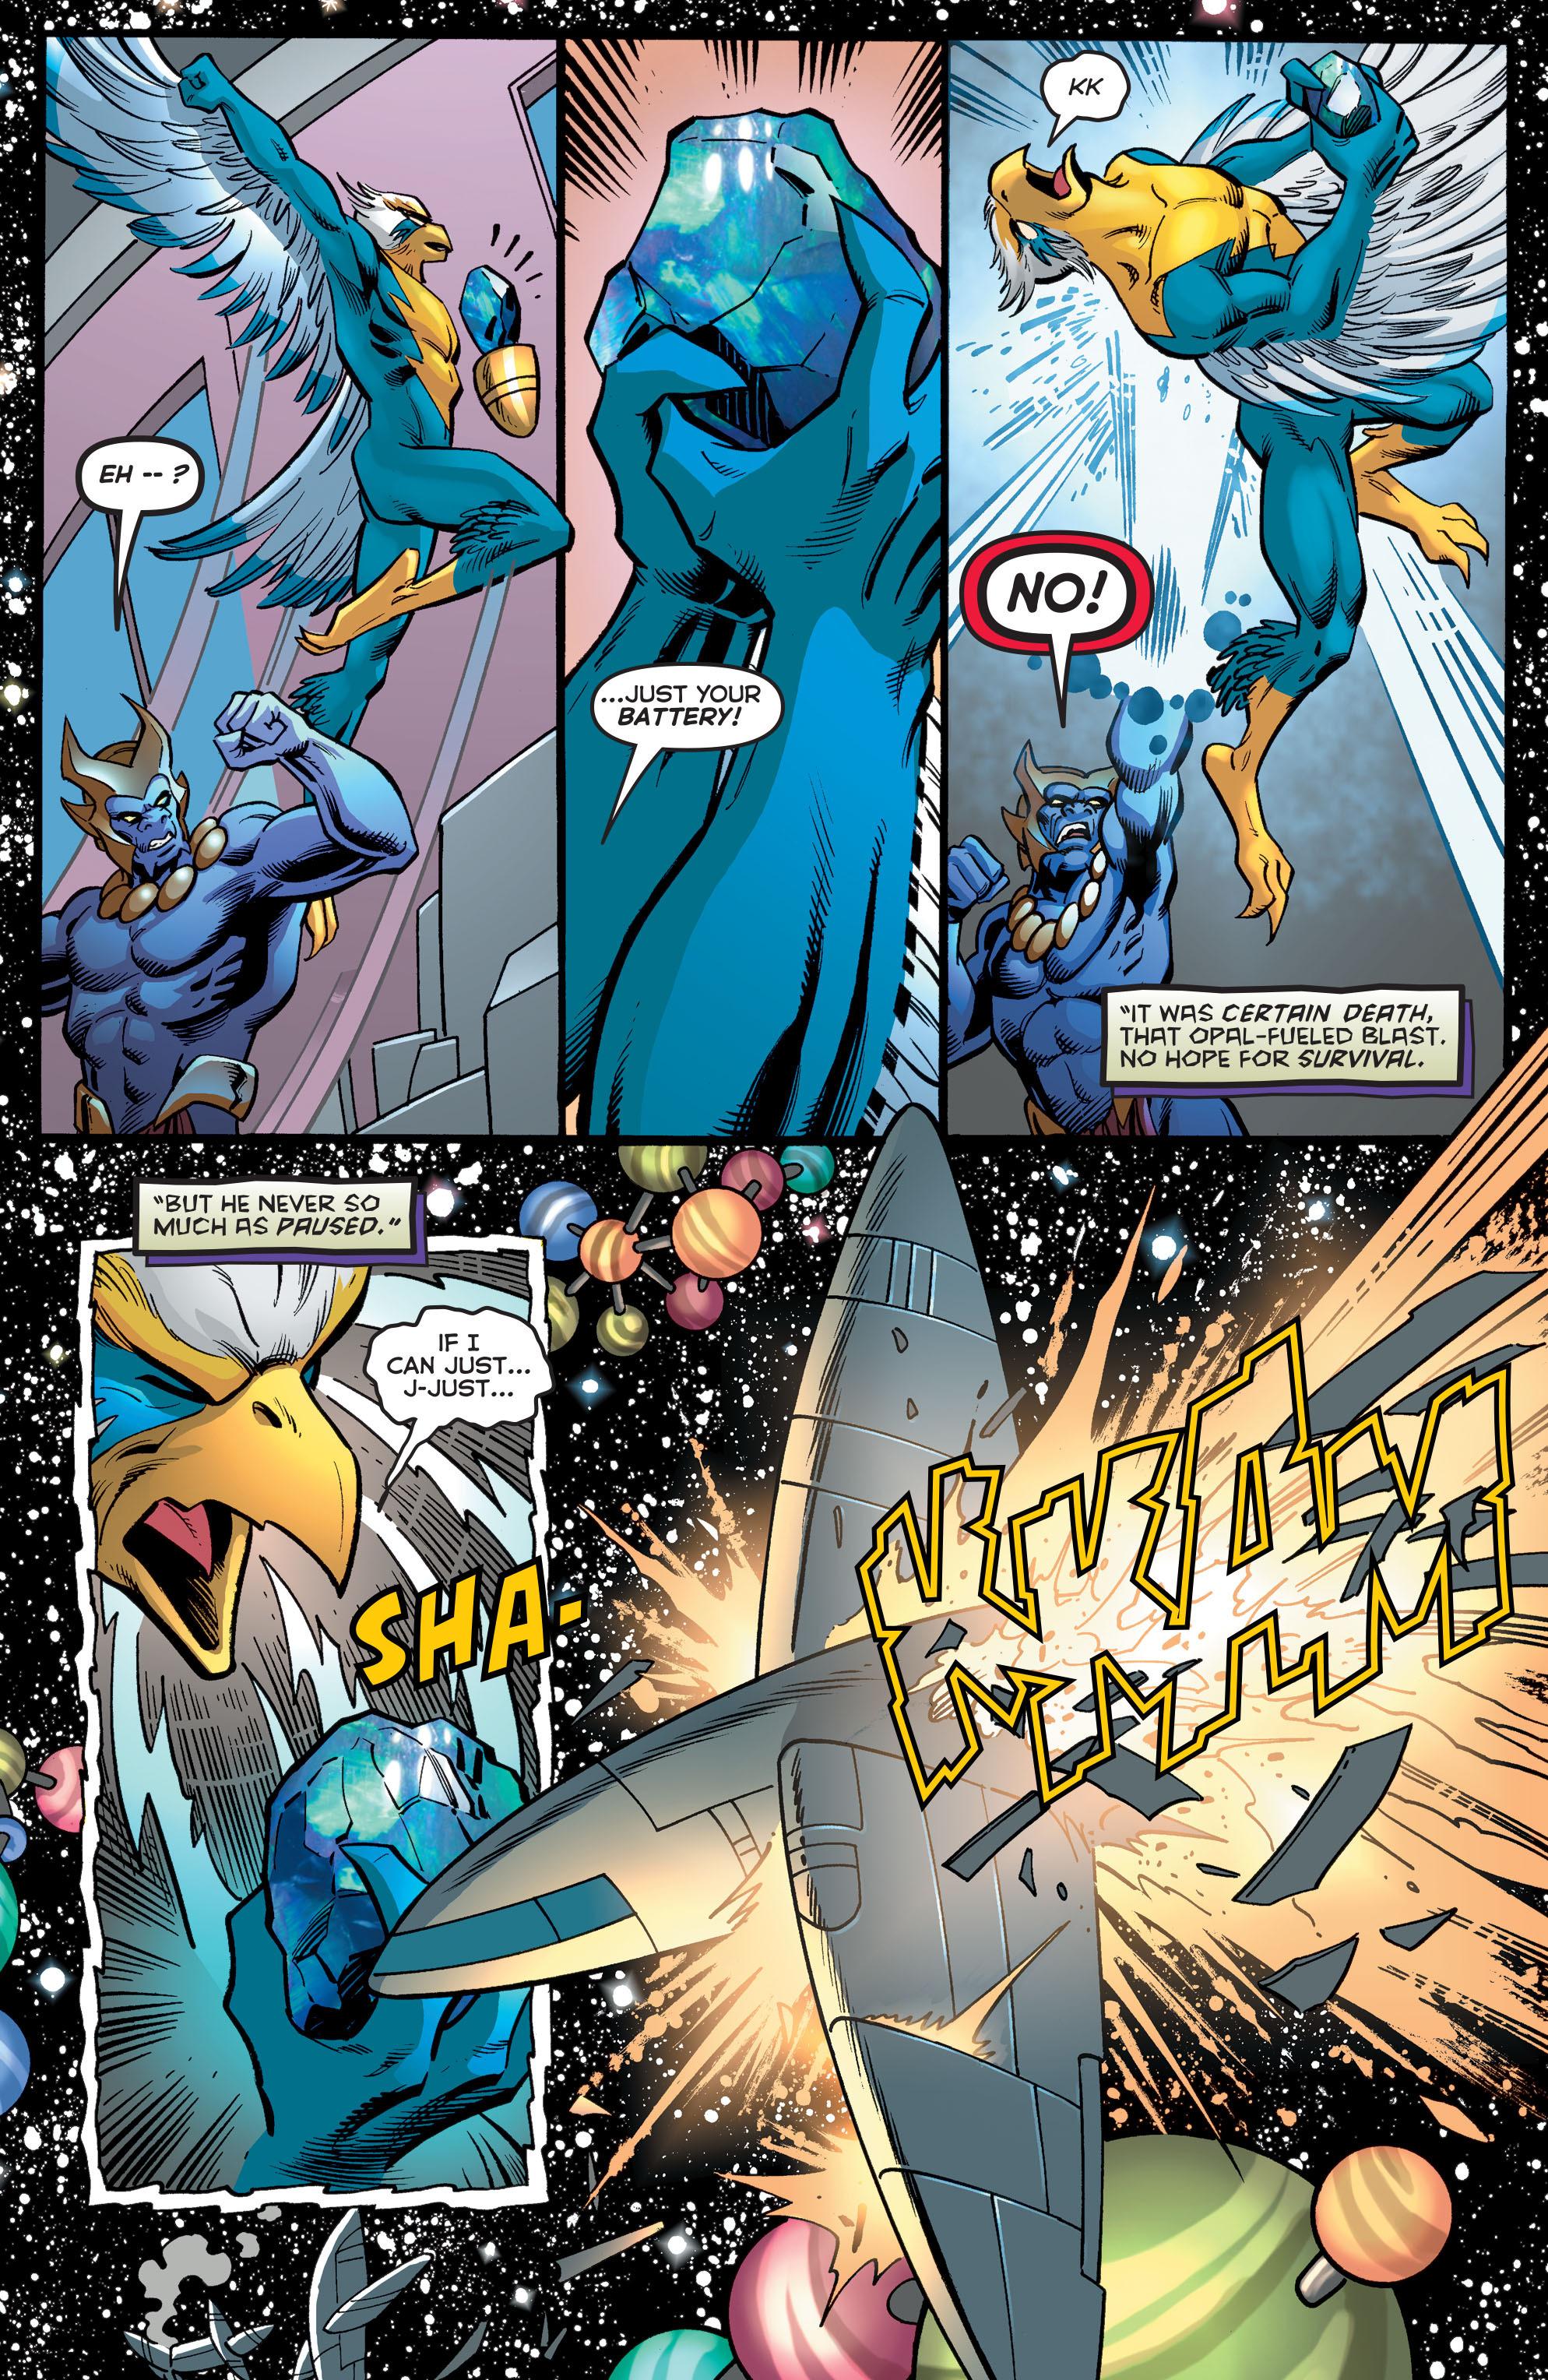 Read online Astro City comic -  Issue #17 - 20